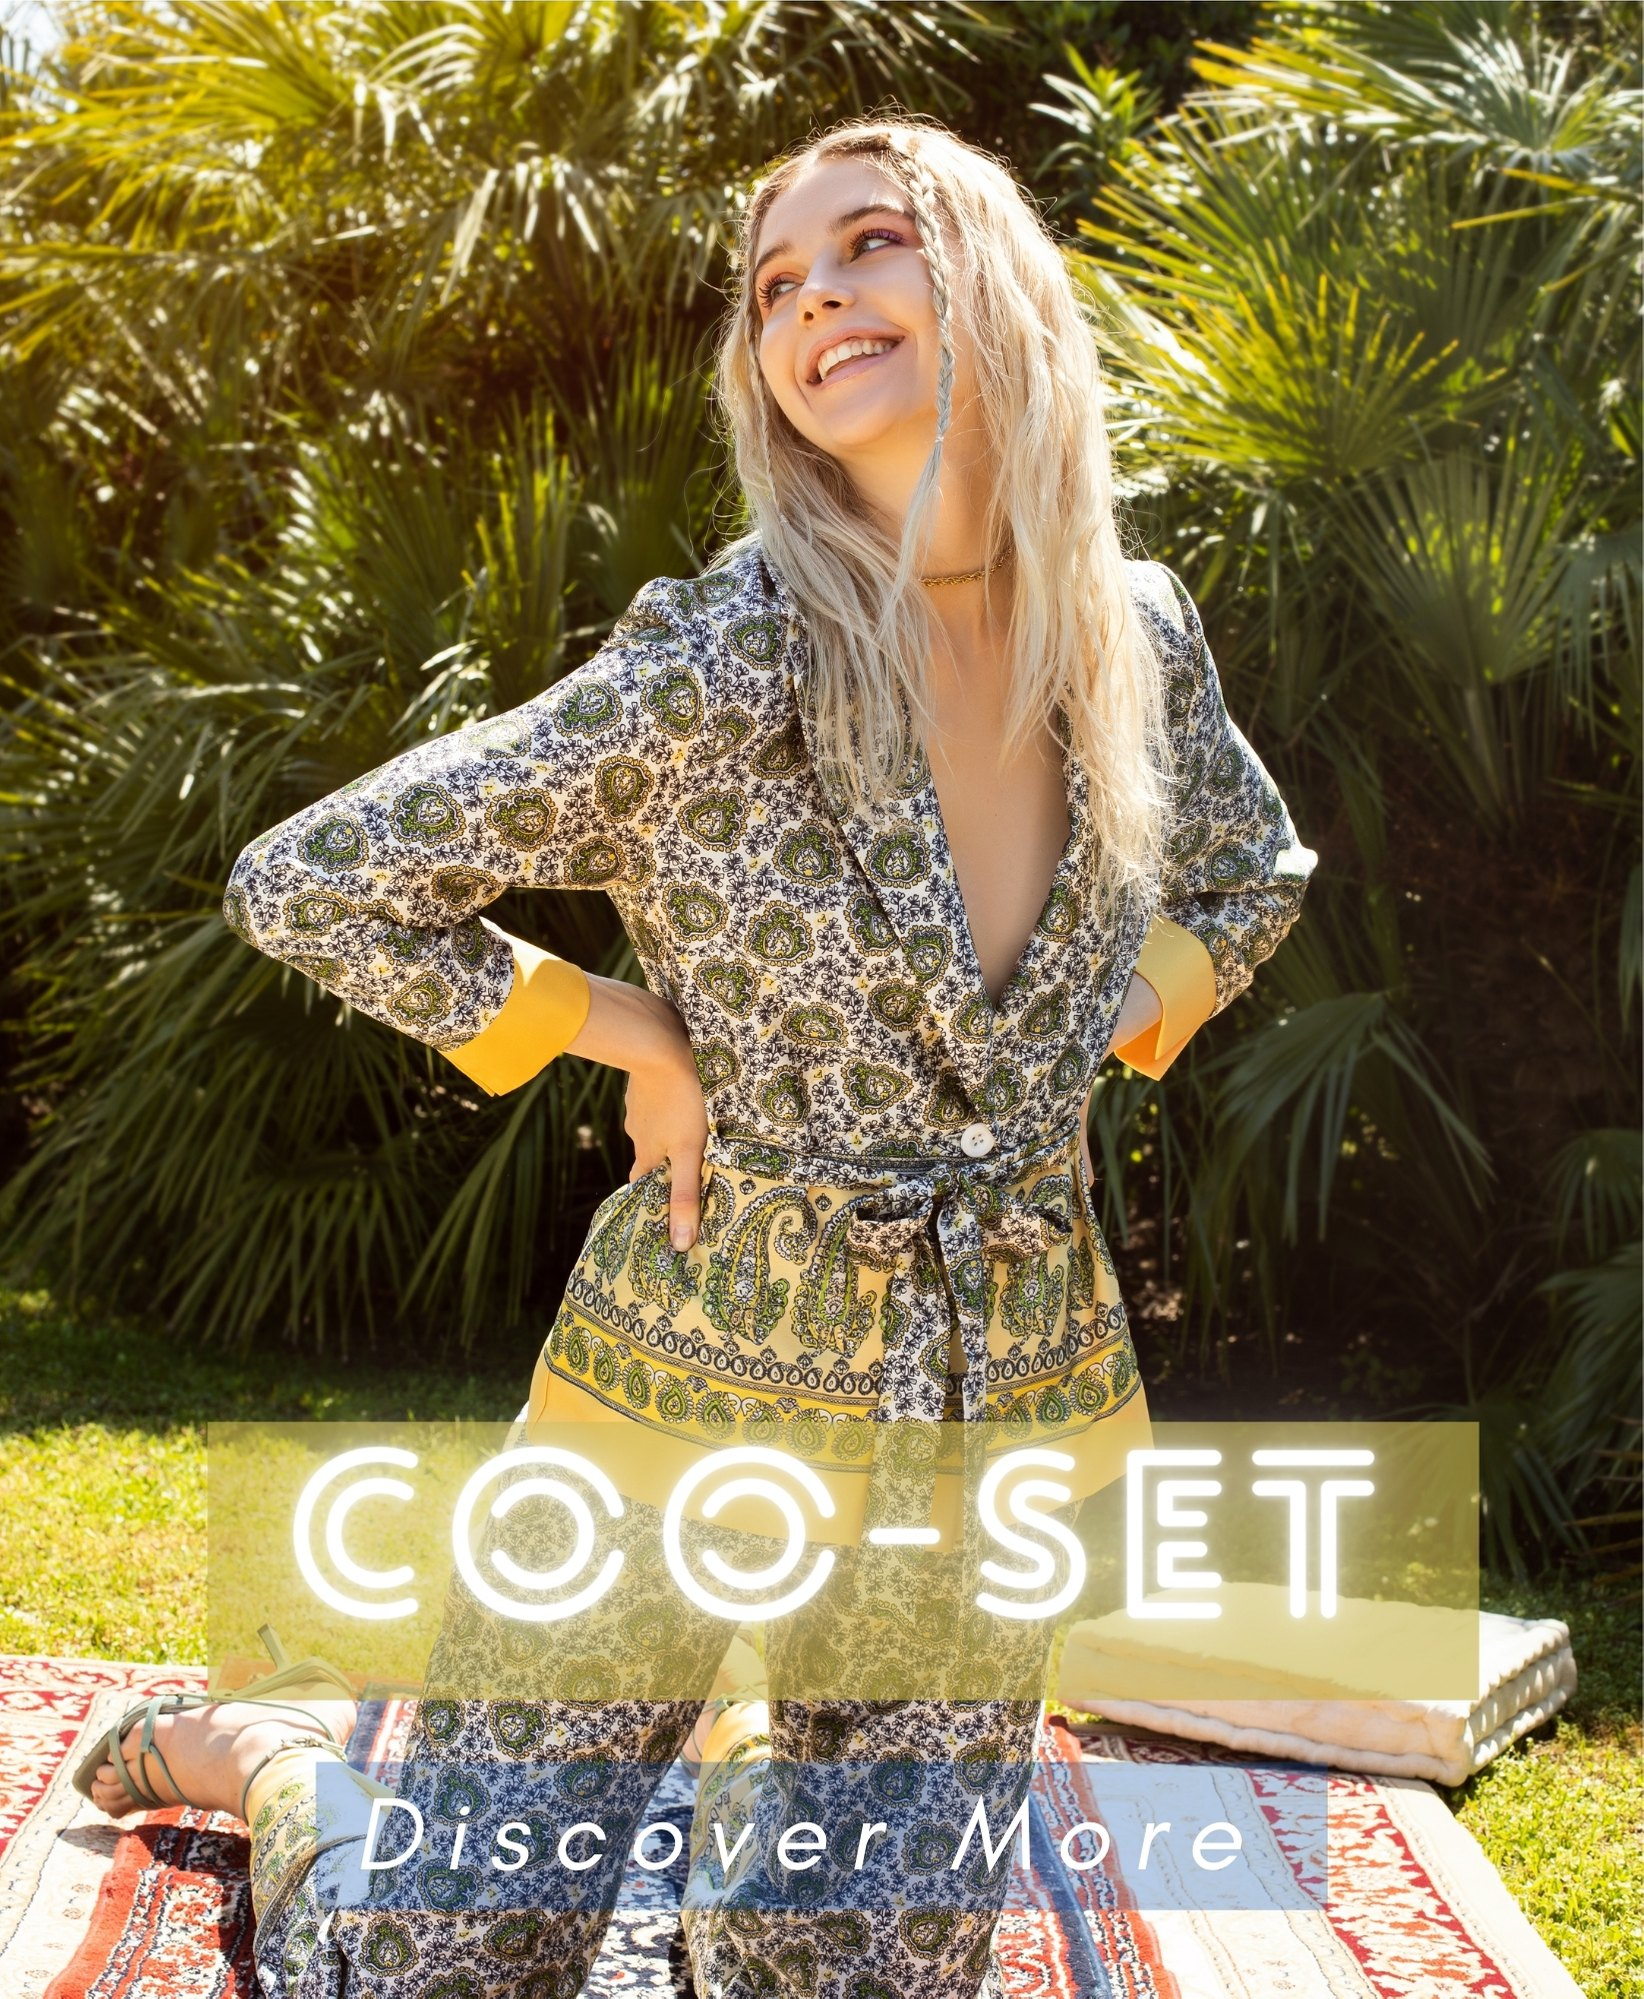 Coo Set Summer 21 Collection | Futur3 Fashion